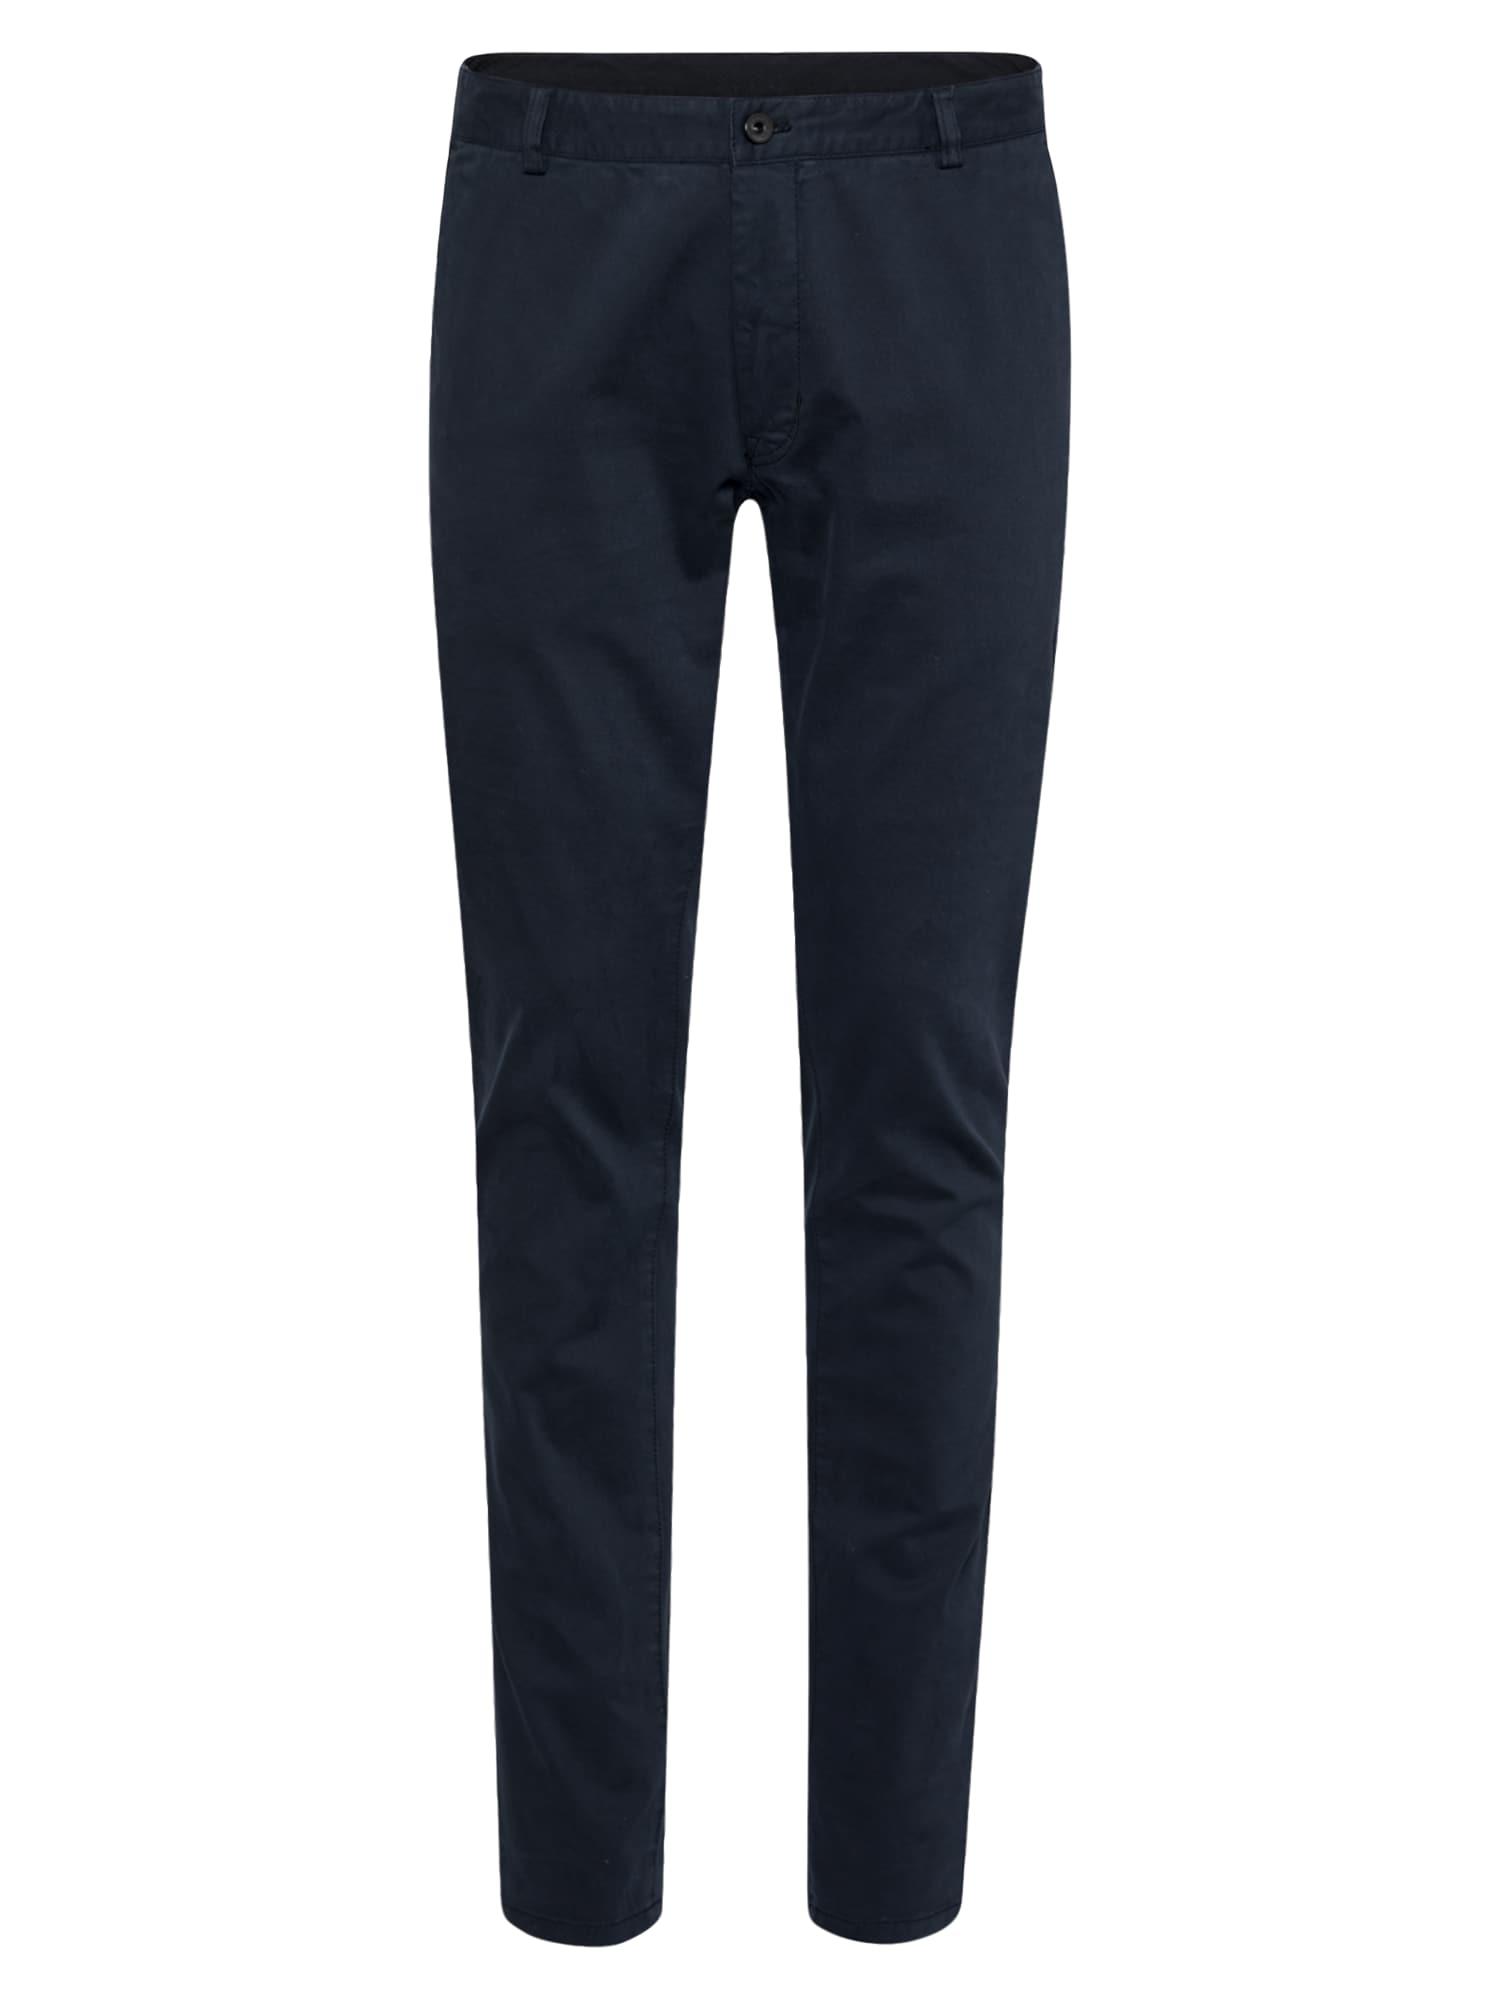 Tiger of Sweden Pantalon 'TRANSIT 4.'  - Bleu - Taille: 52 - male